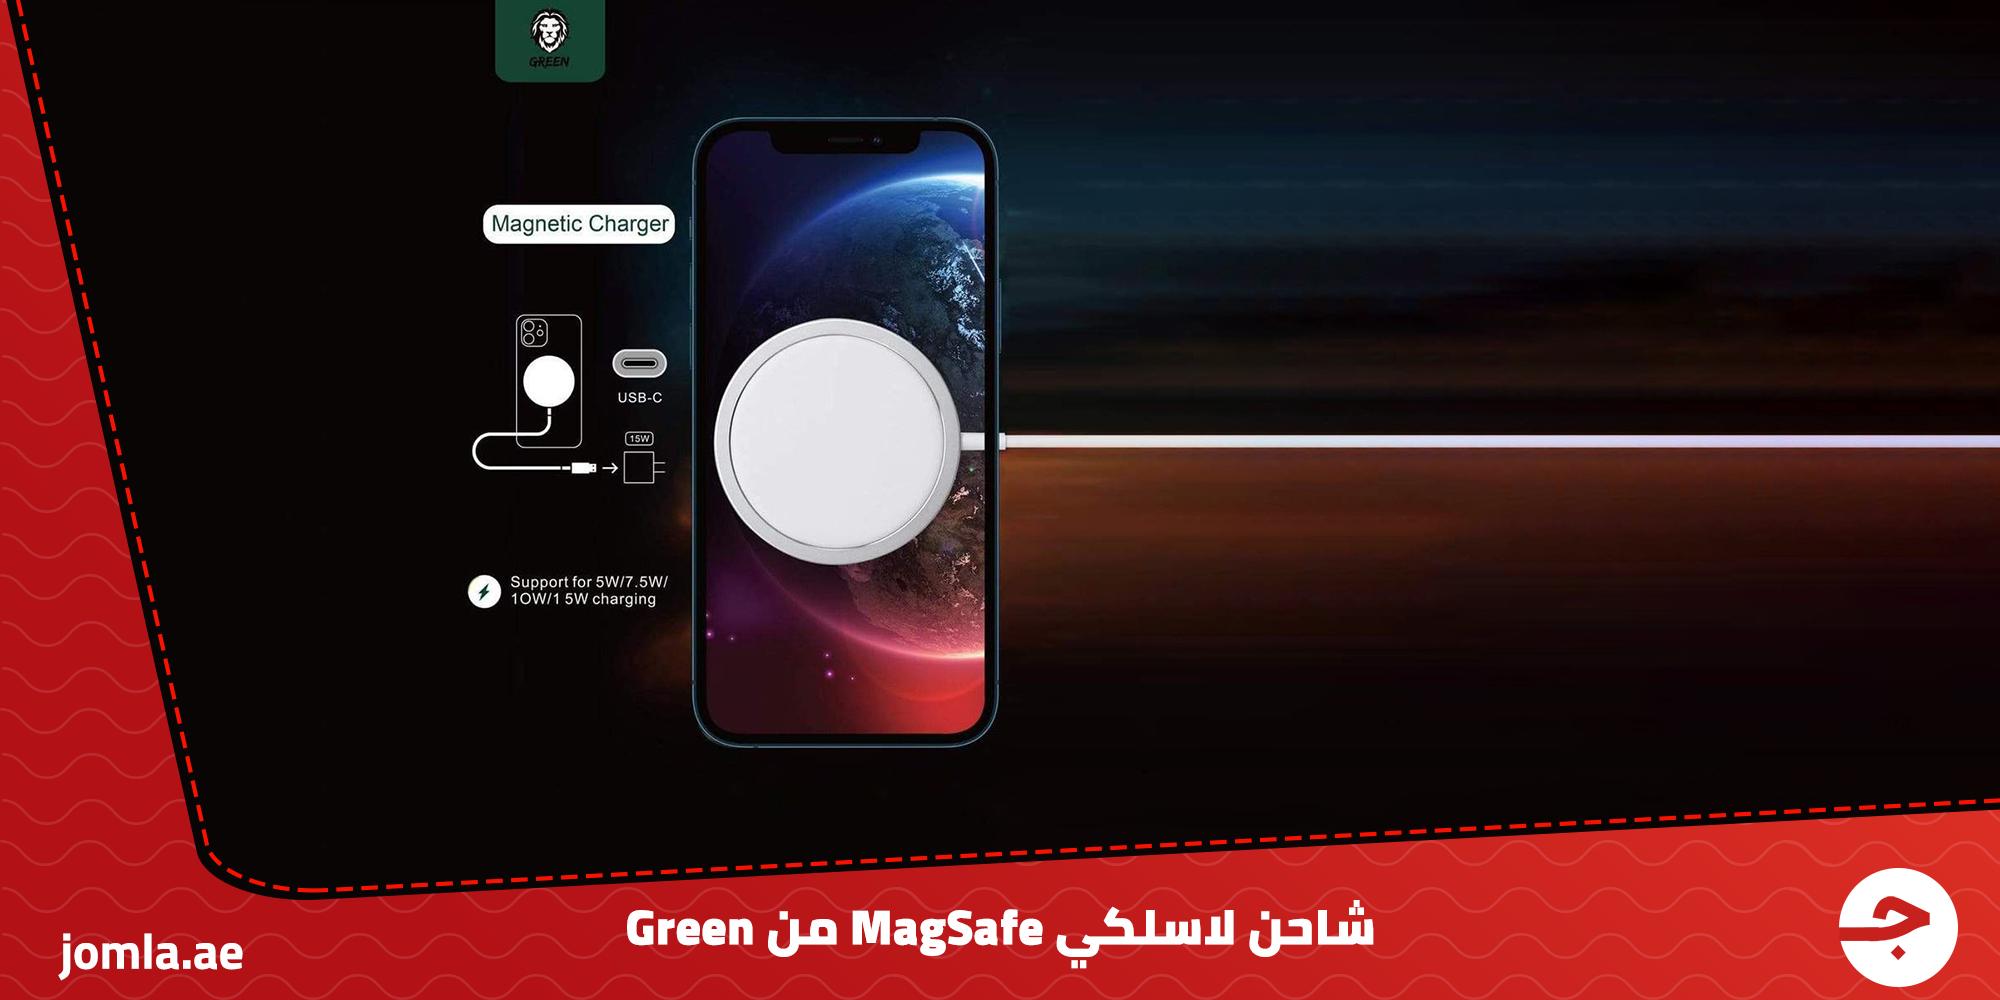 Green MagSafe